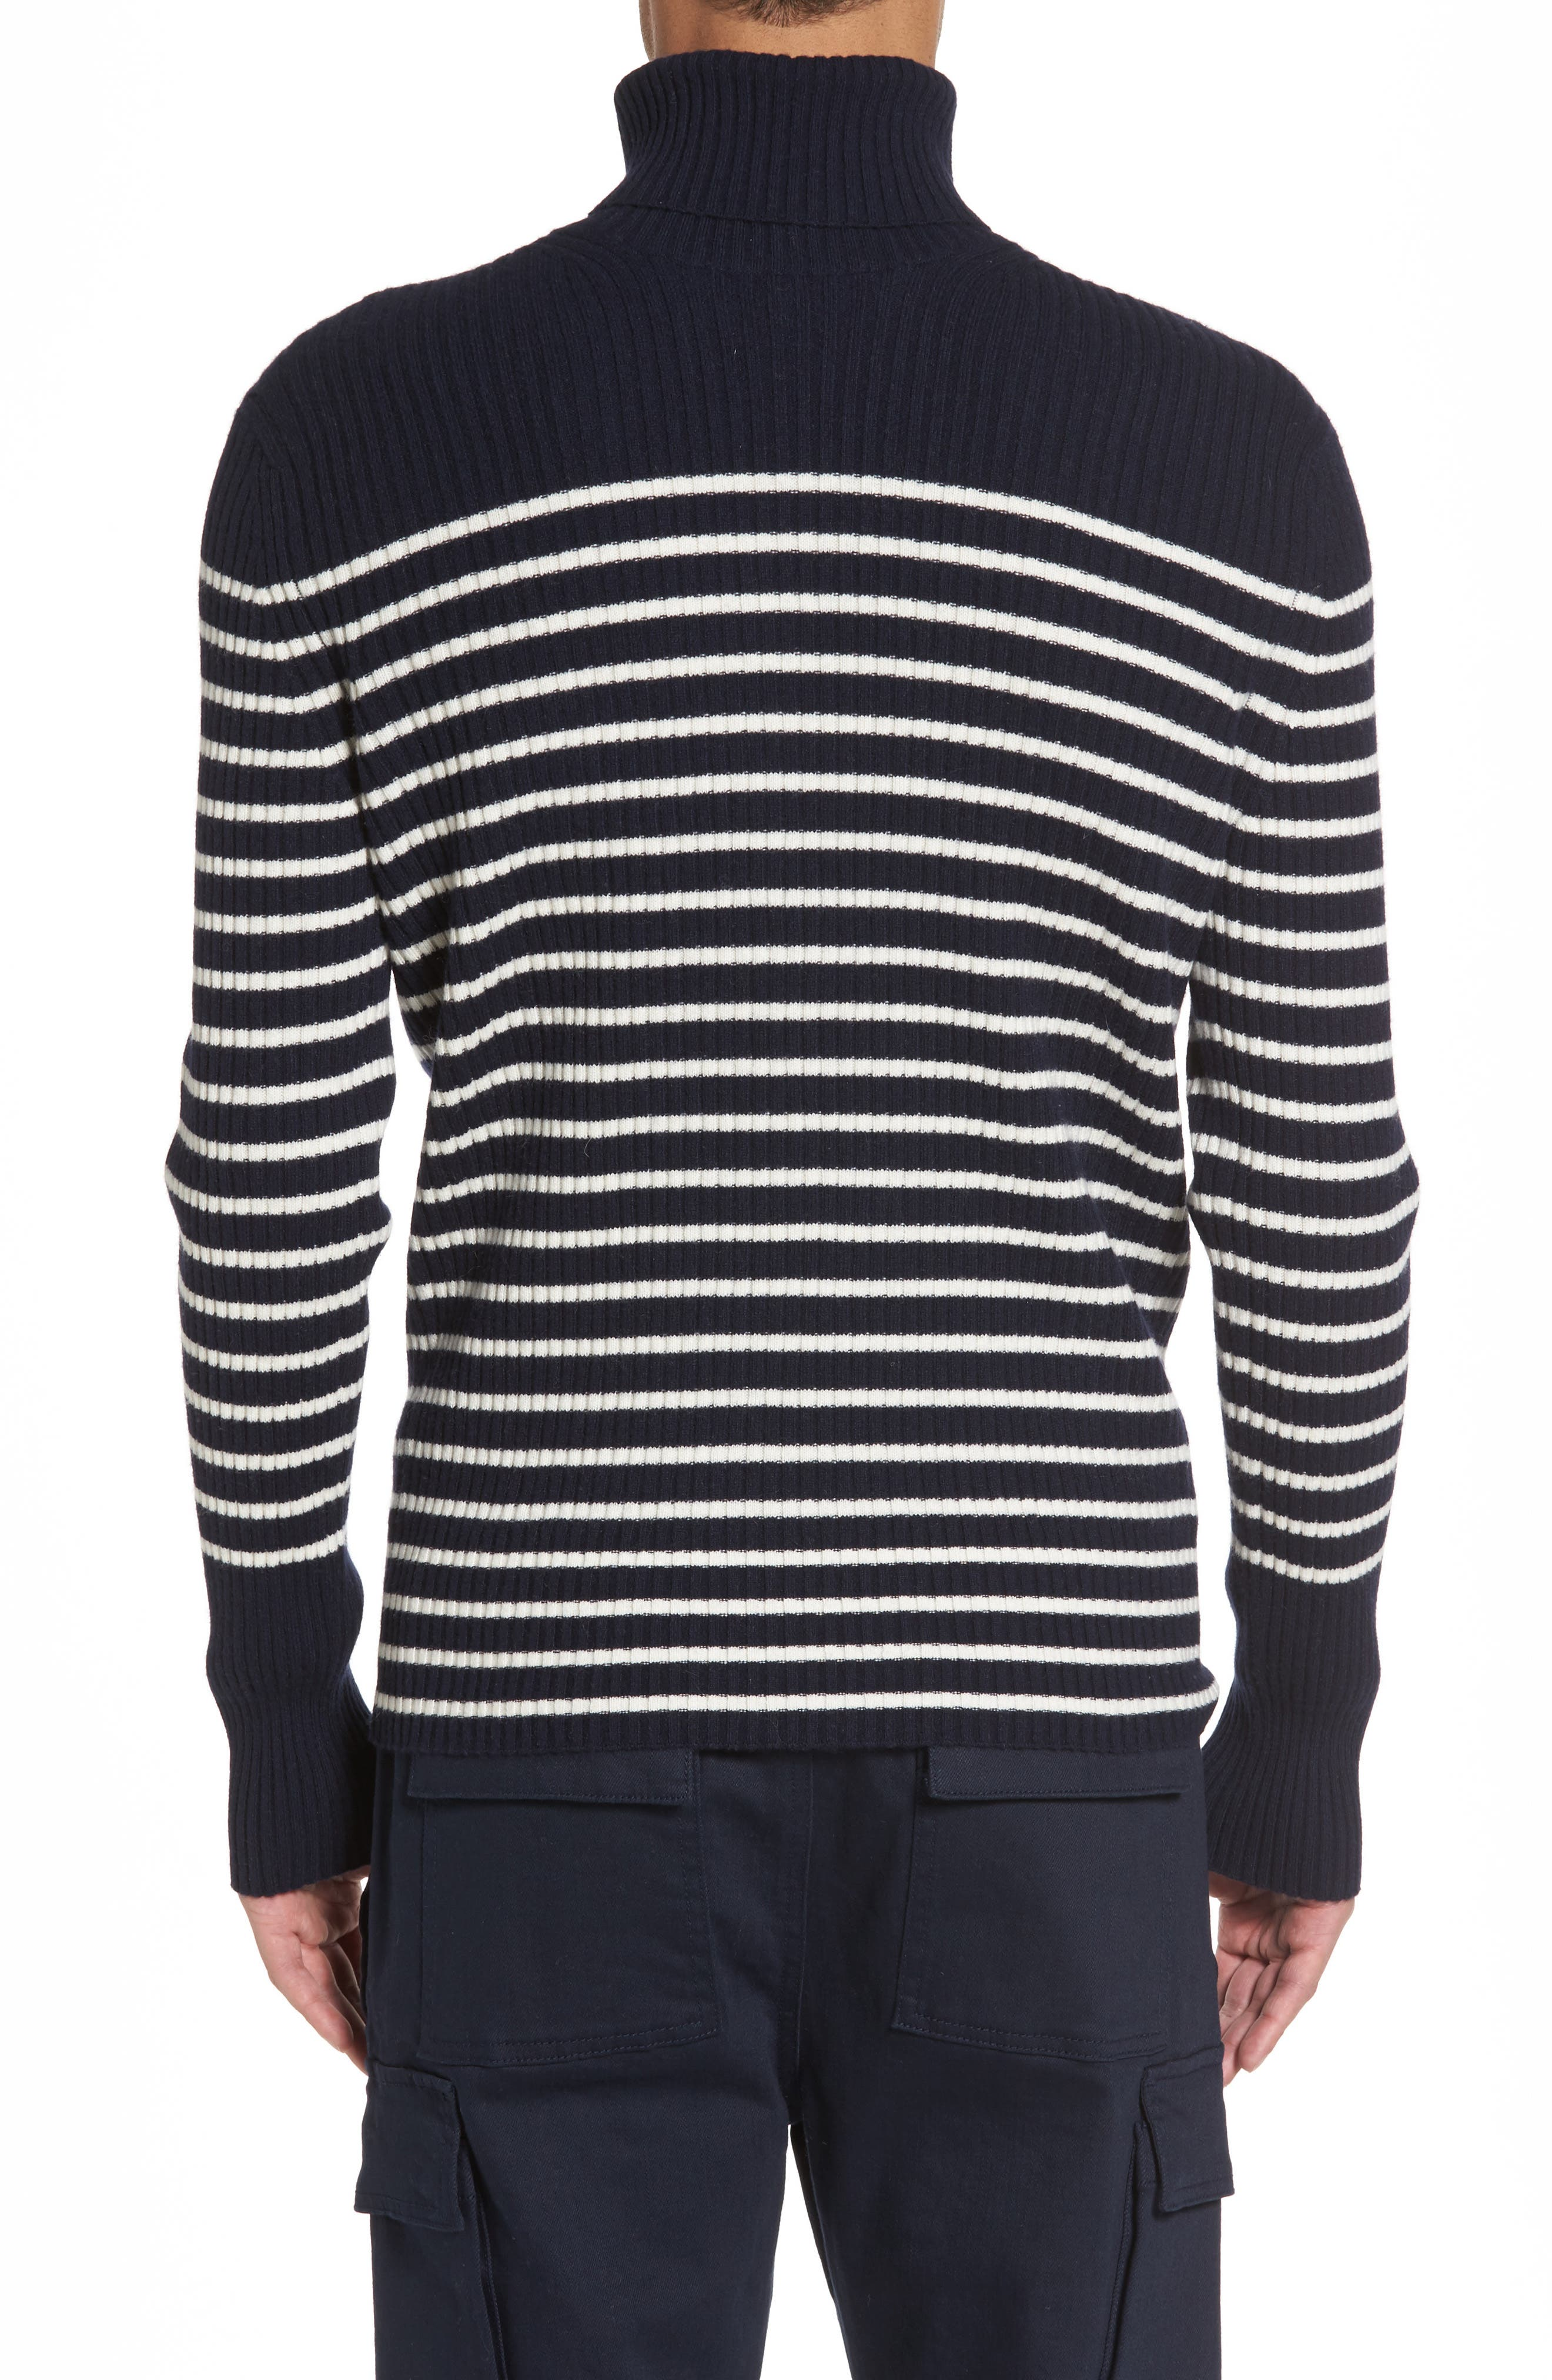 Regular Fit Breton Stripe Cashmere Turtleneck Sweater,                             Alternate thumbnail 2, color,                             Coastal/ Breeze